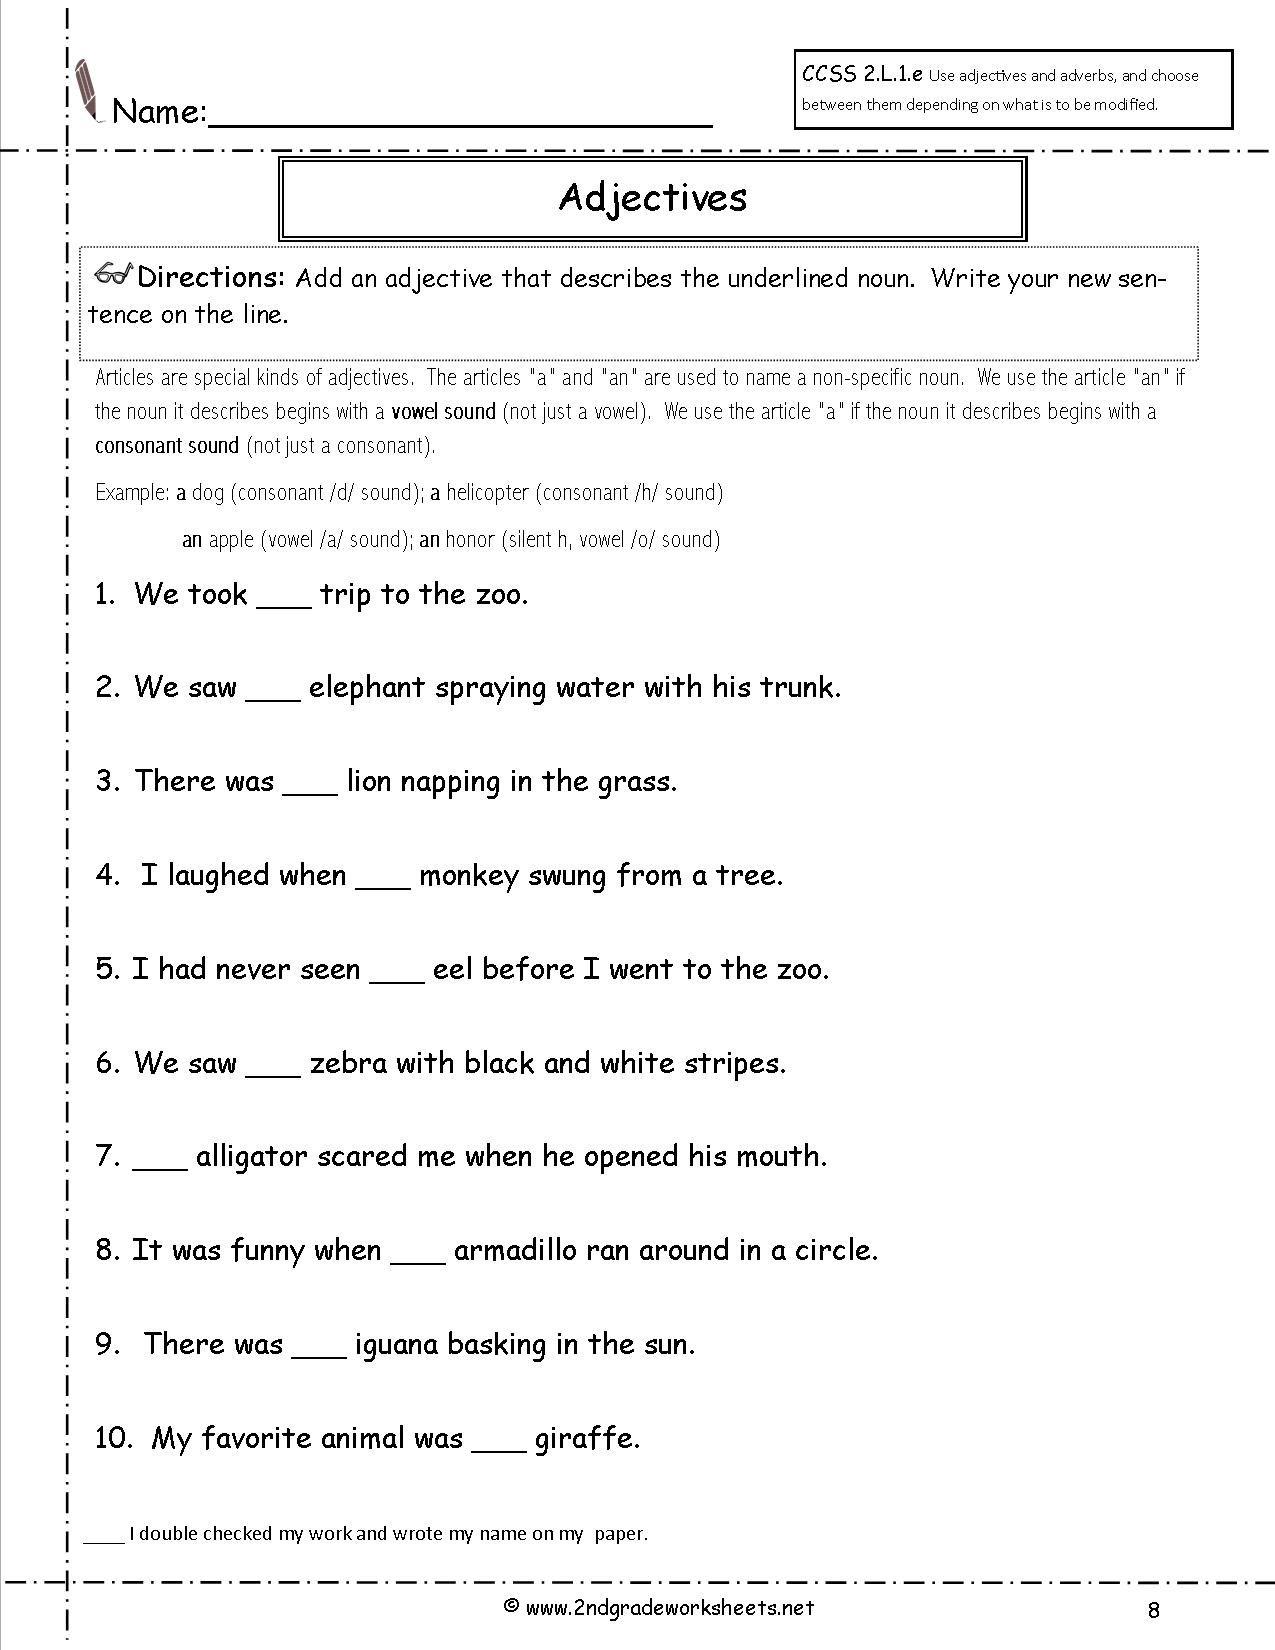 Free 1st Grade Grammar Worksheets Pictures